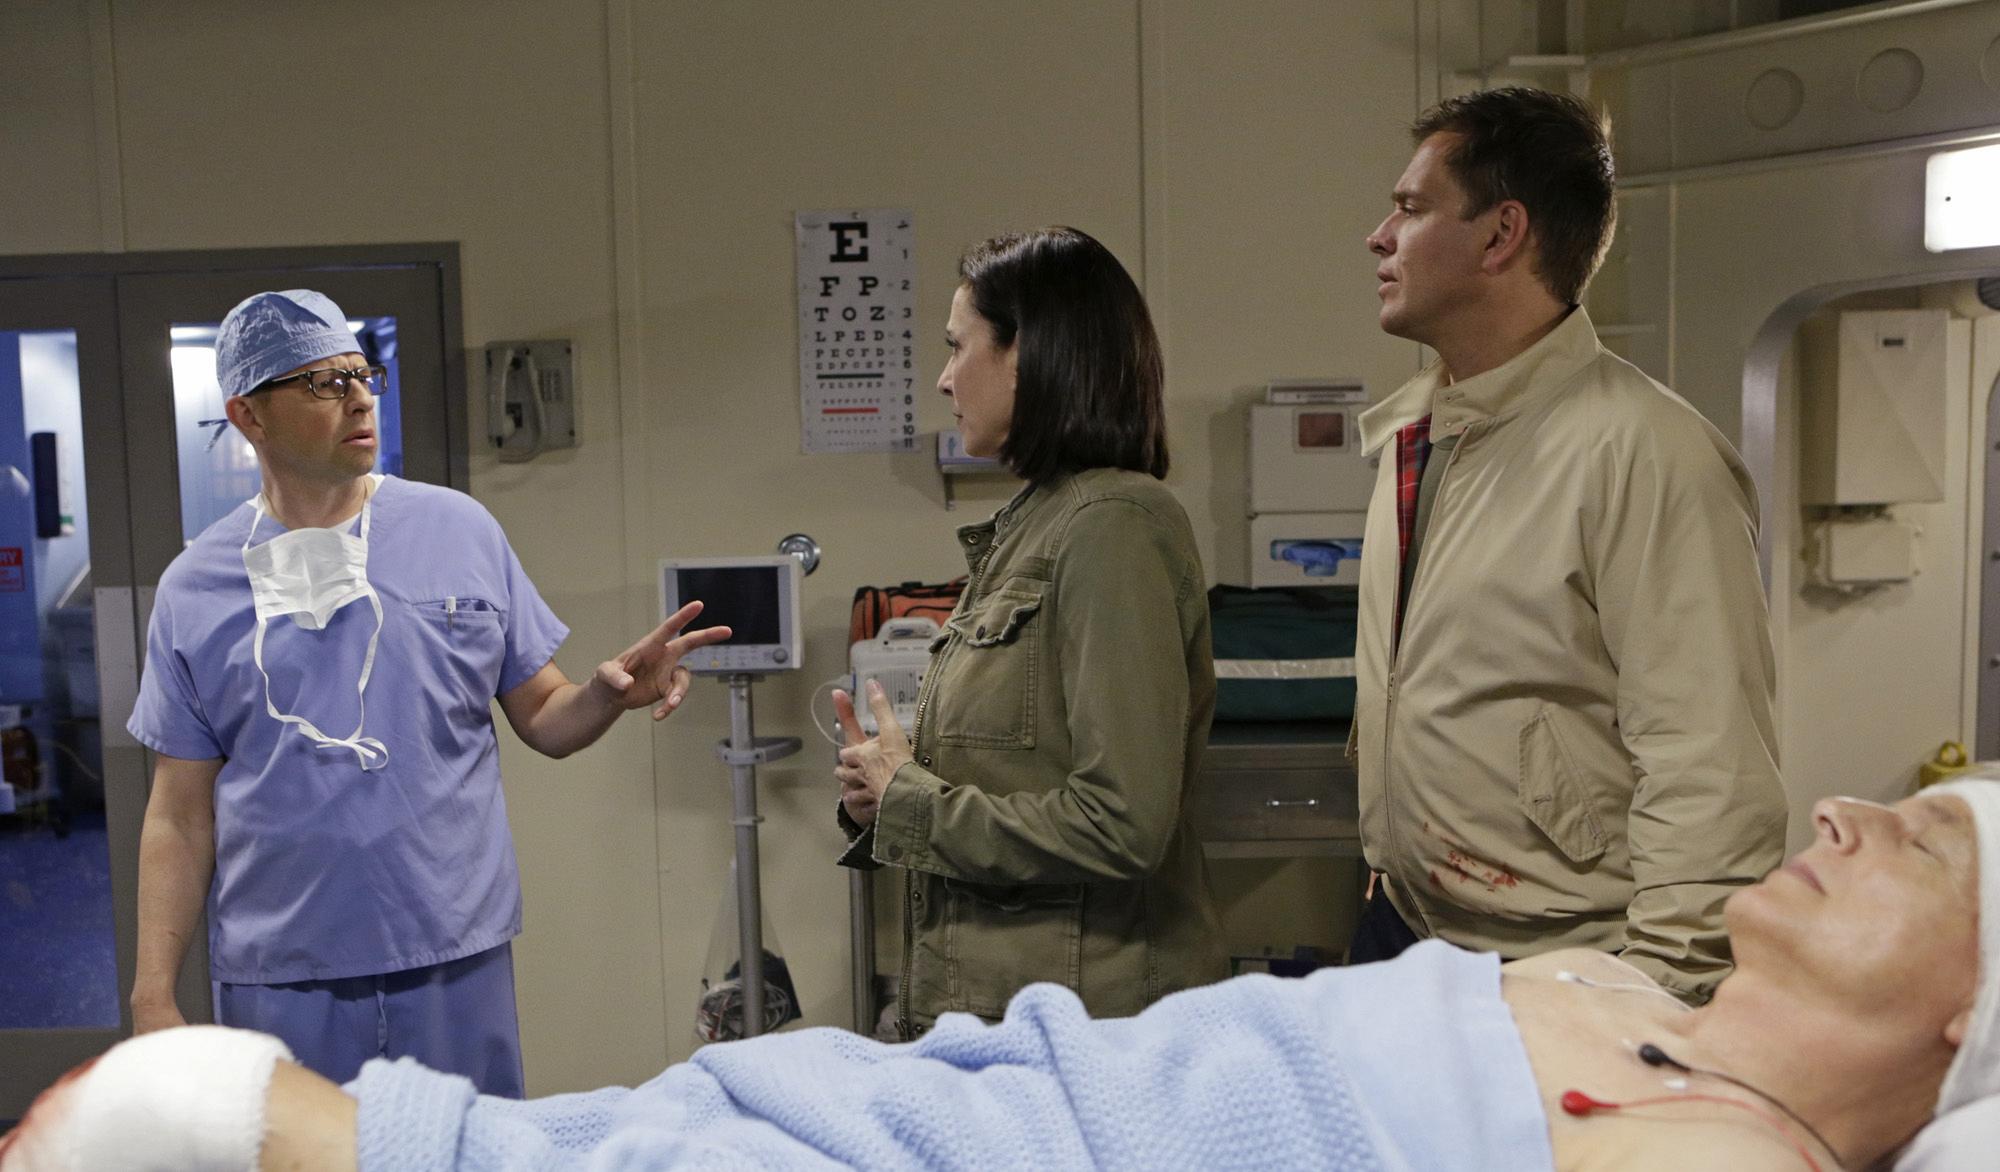 Jon Cryer as Dr. Cyril Taft, Mimi Rogers as Joanna Teague, Michael Weatherly as Anthony DiNozzo, and Mark Harmon as Leroy Jethro Gibbs.